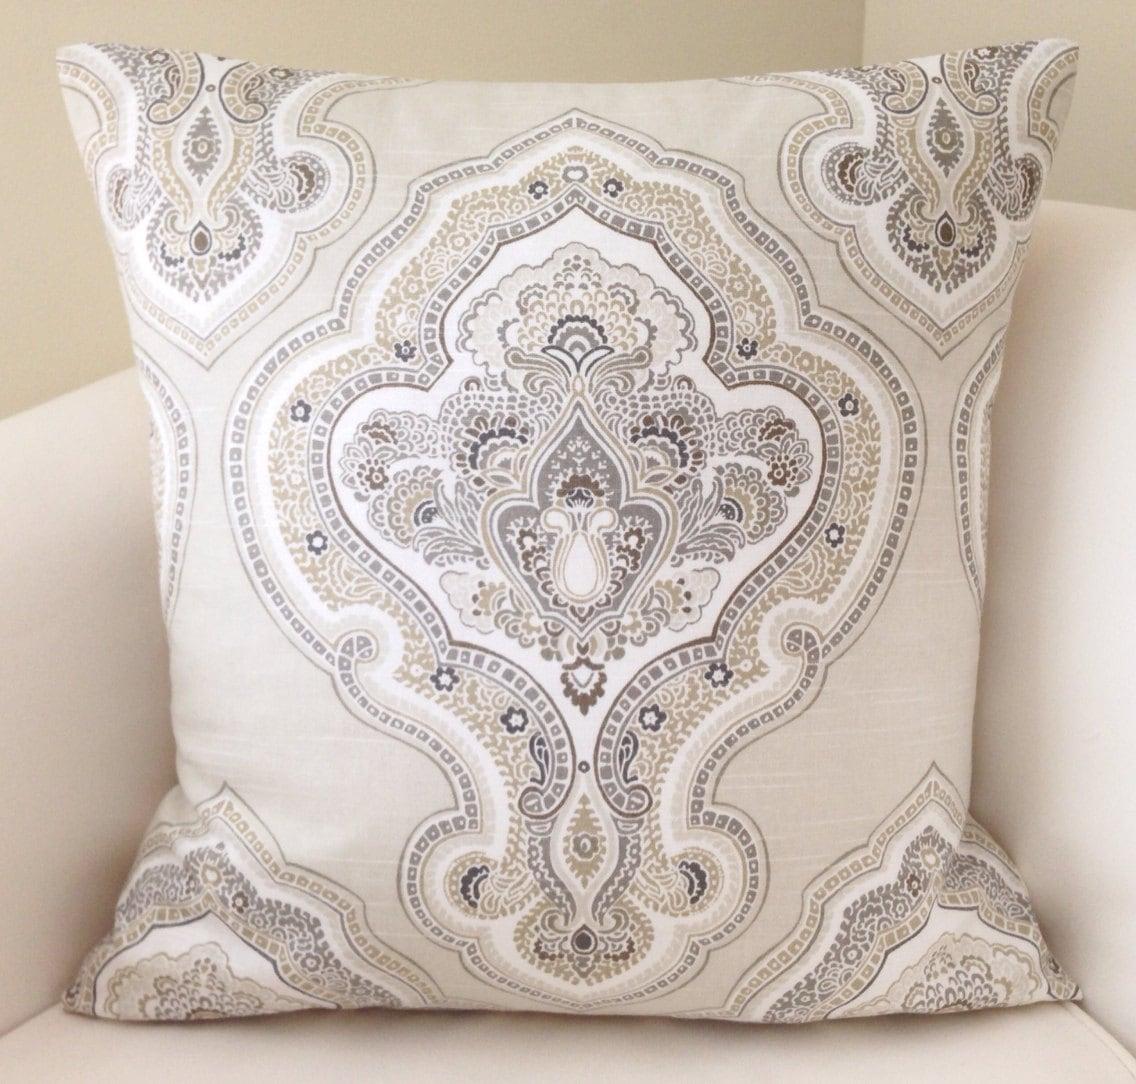 Decorative Pillows Neutral : Decorative Throw Pillow Cover Neutral Pillow Cushion Accent